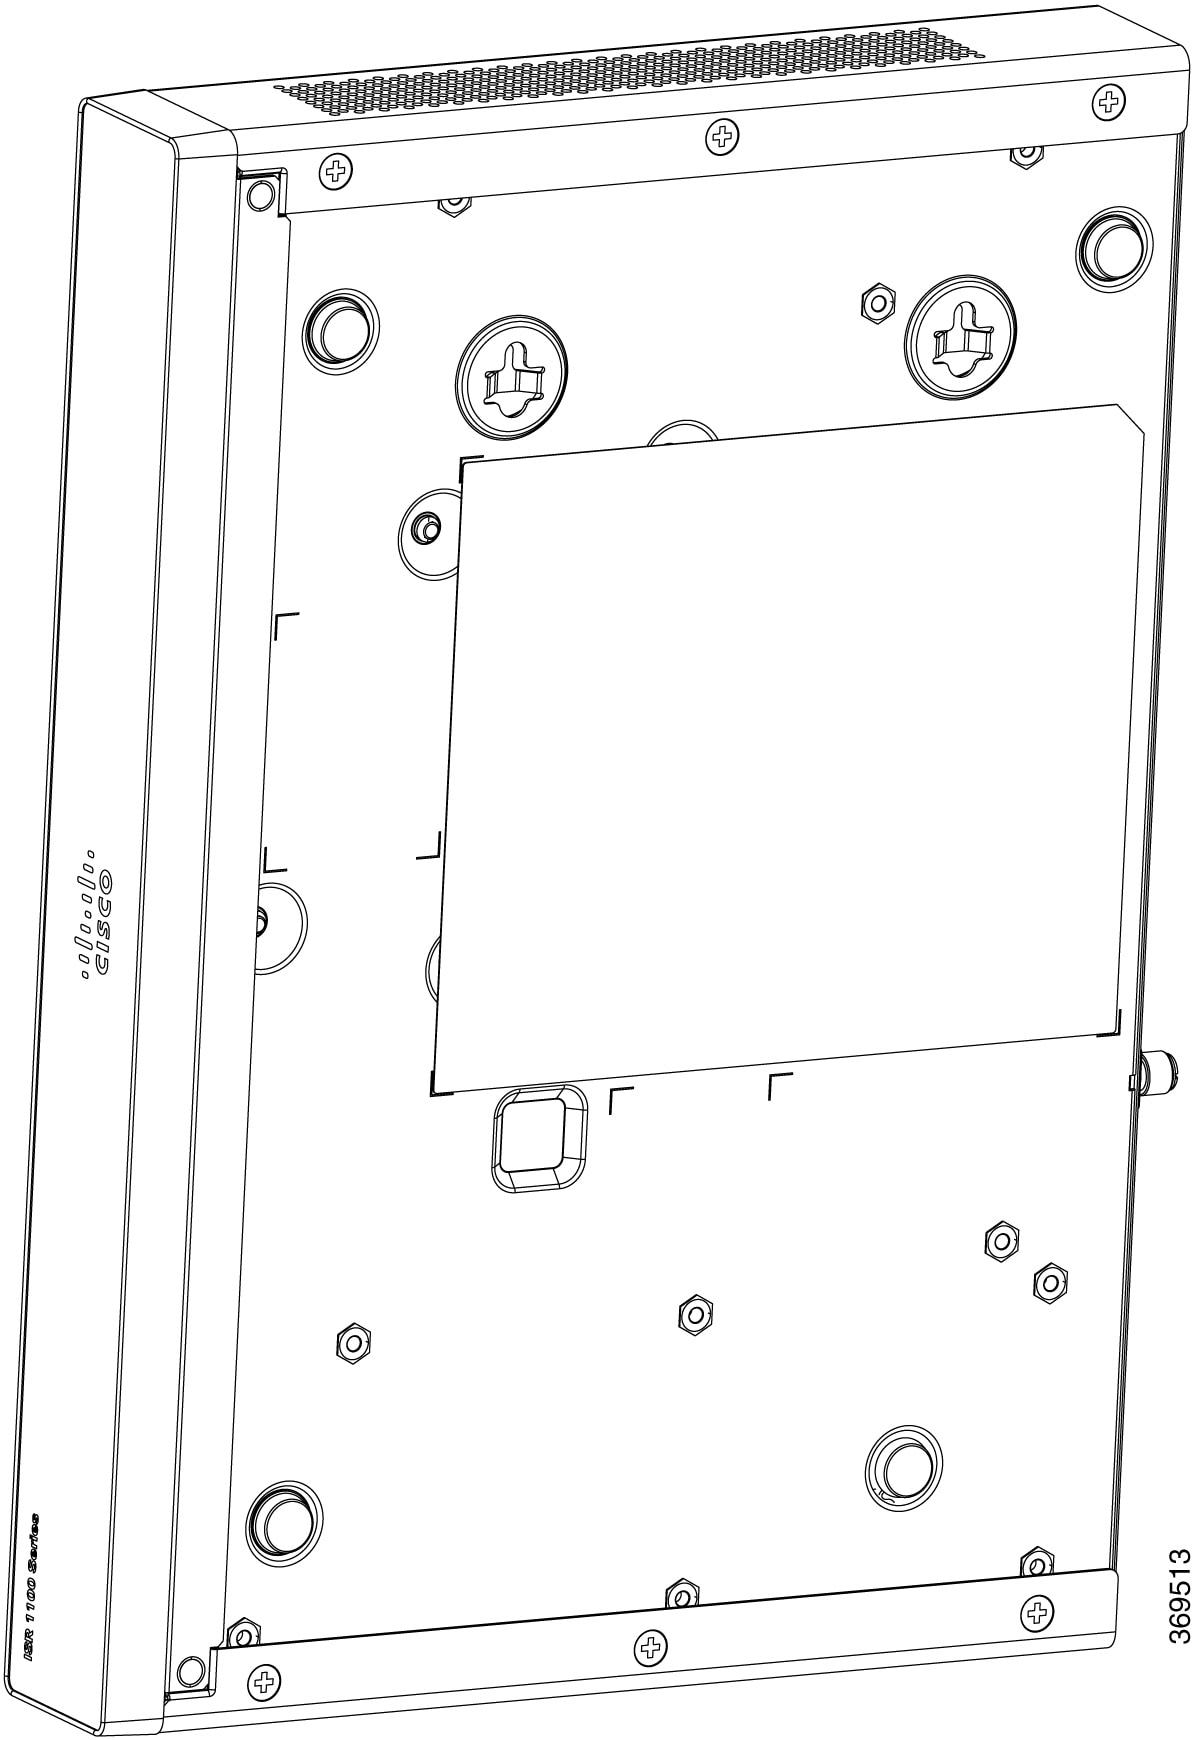 New Zealand Telephone Wiring Diagram